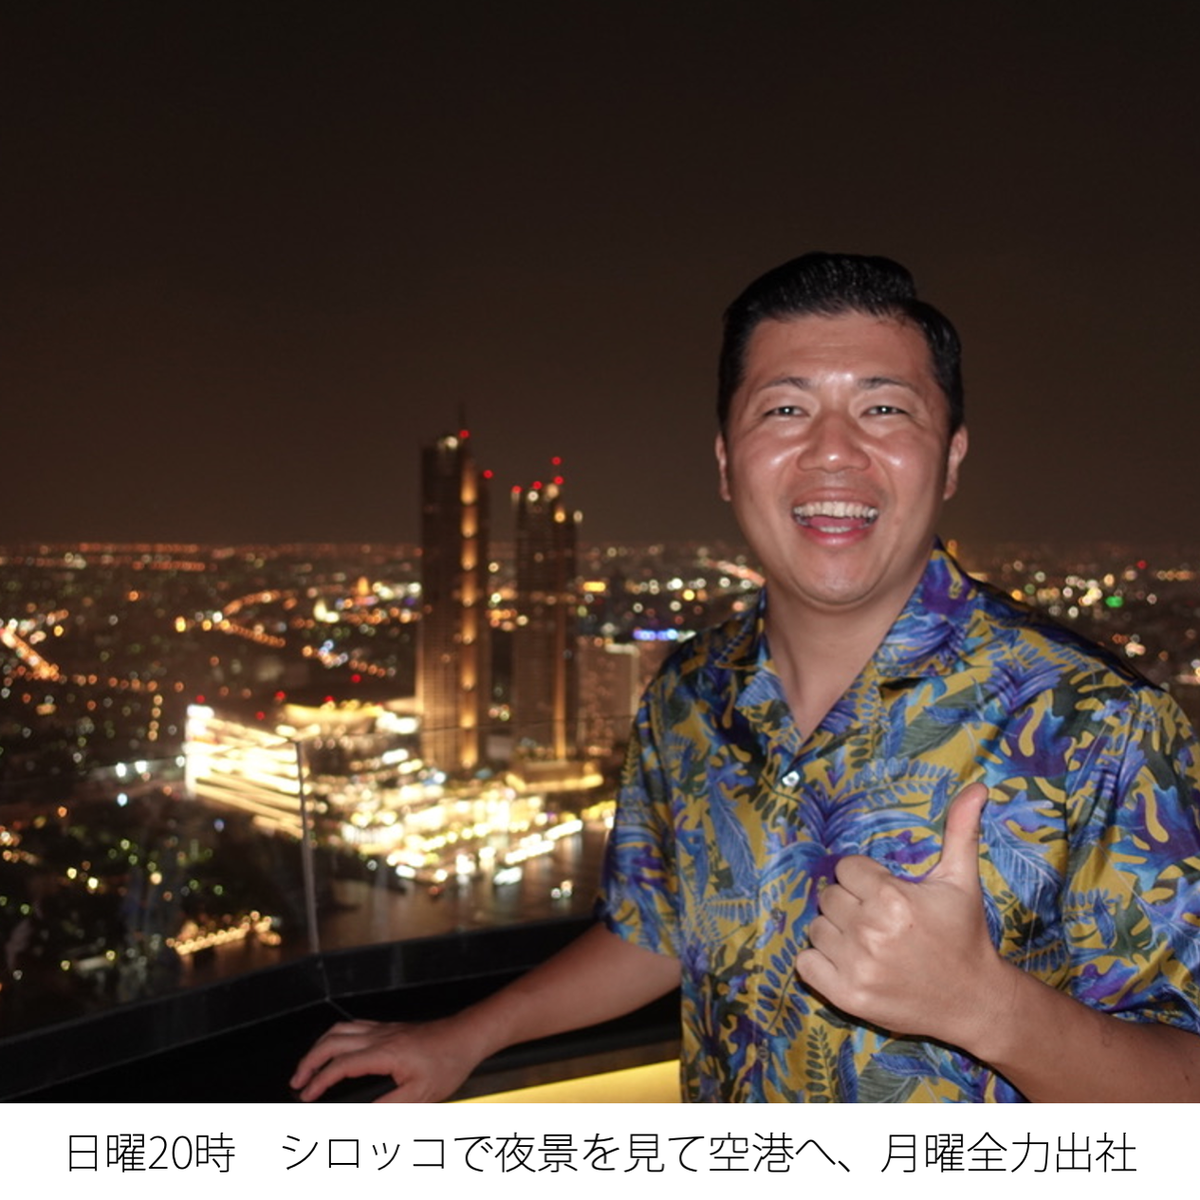 f:id:tomatsu1024:20210815220028p:plain